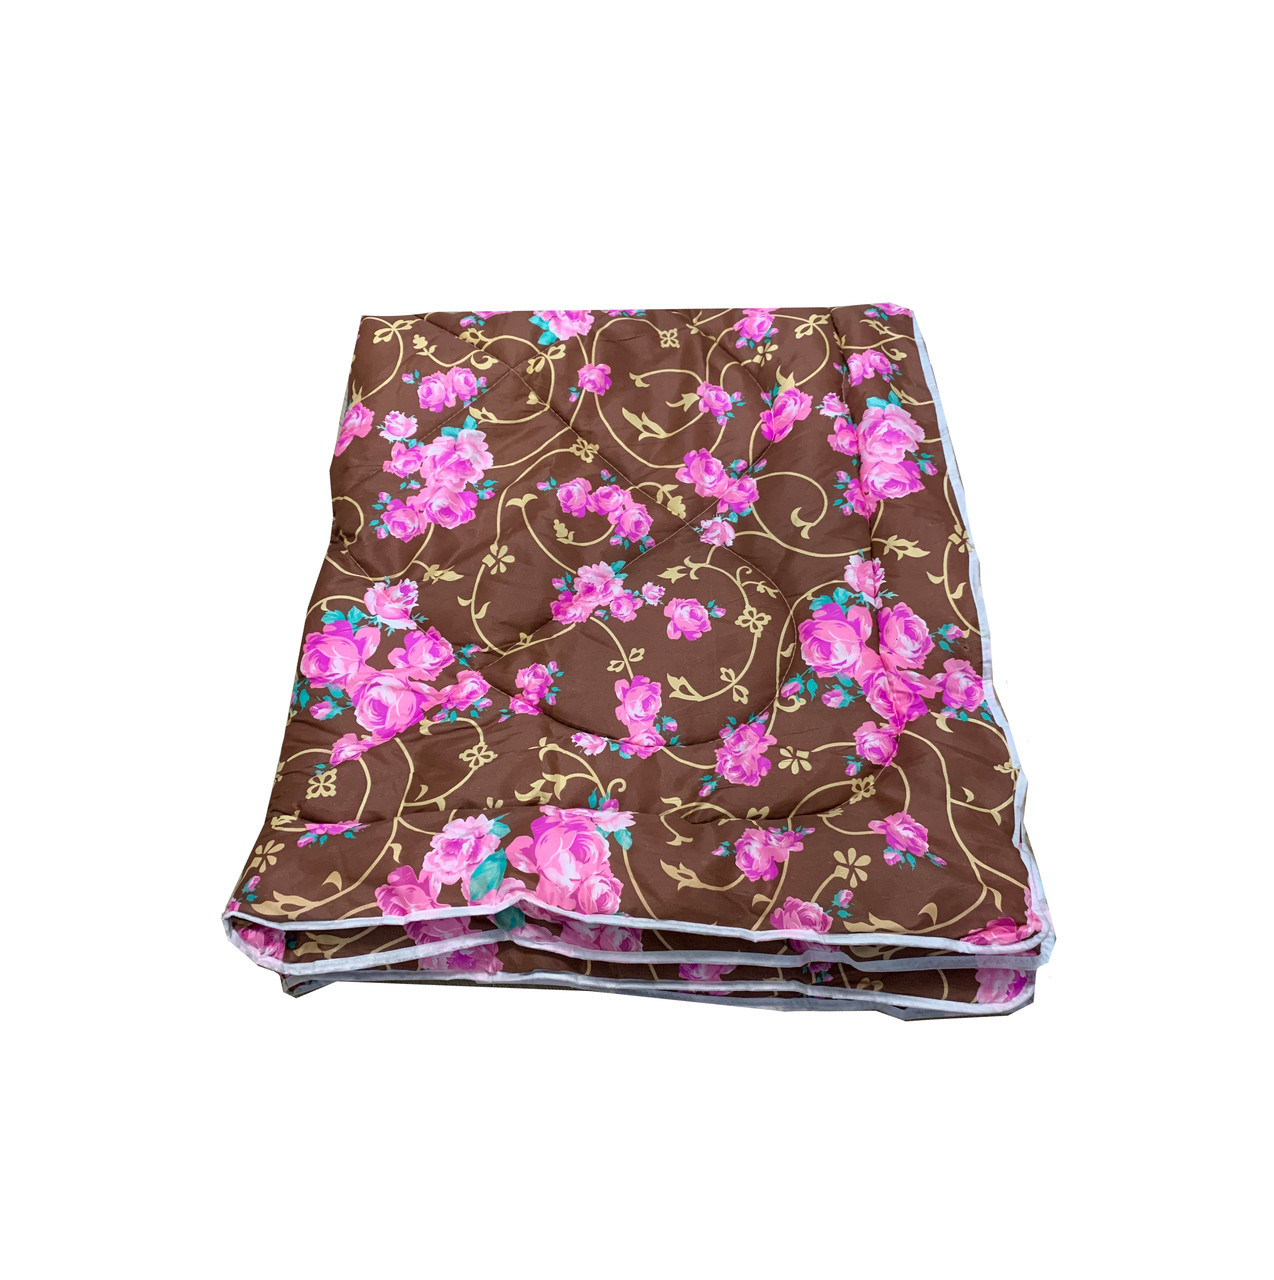 Одеяло коричневое двуспальное, холлофайбер 180*220 см, Украина